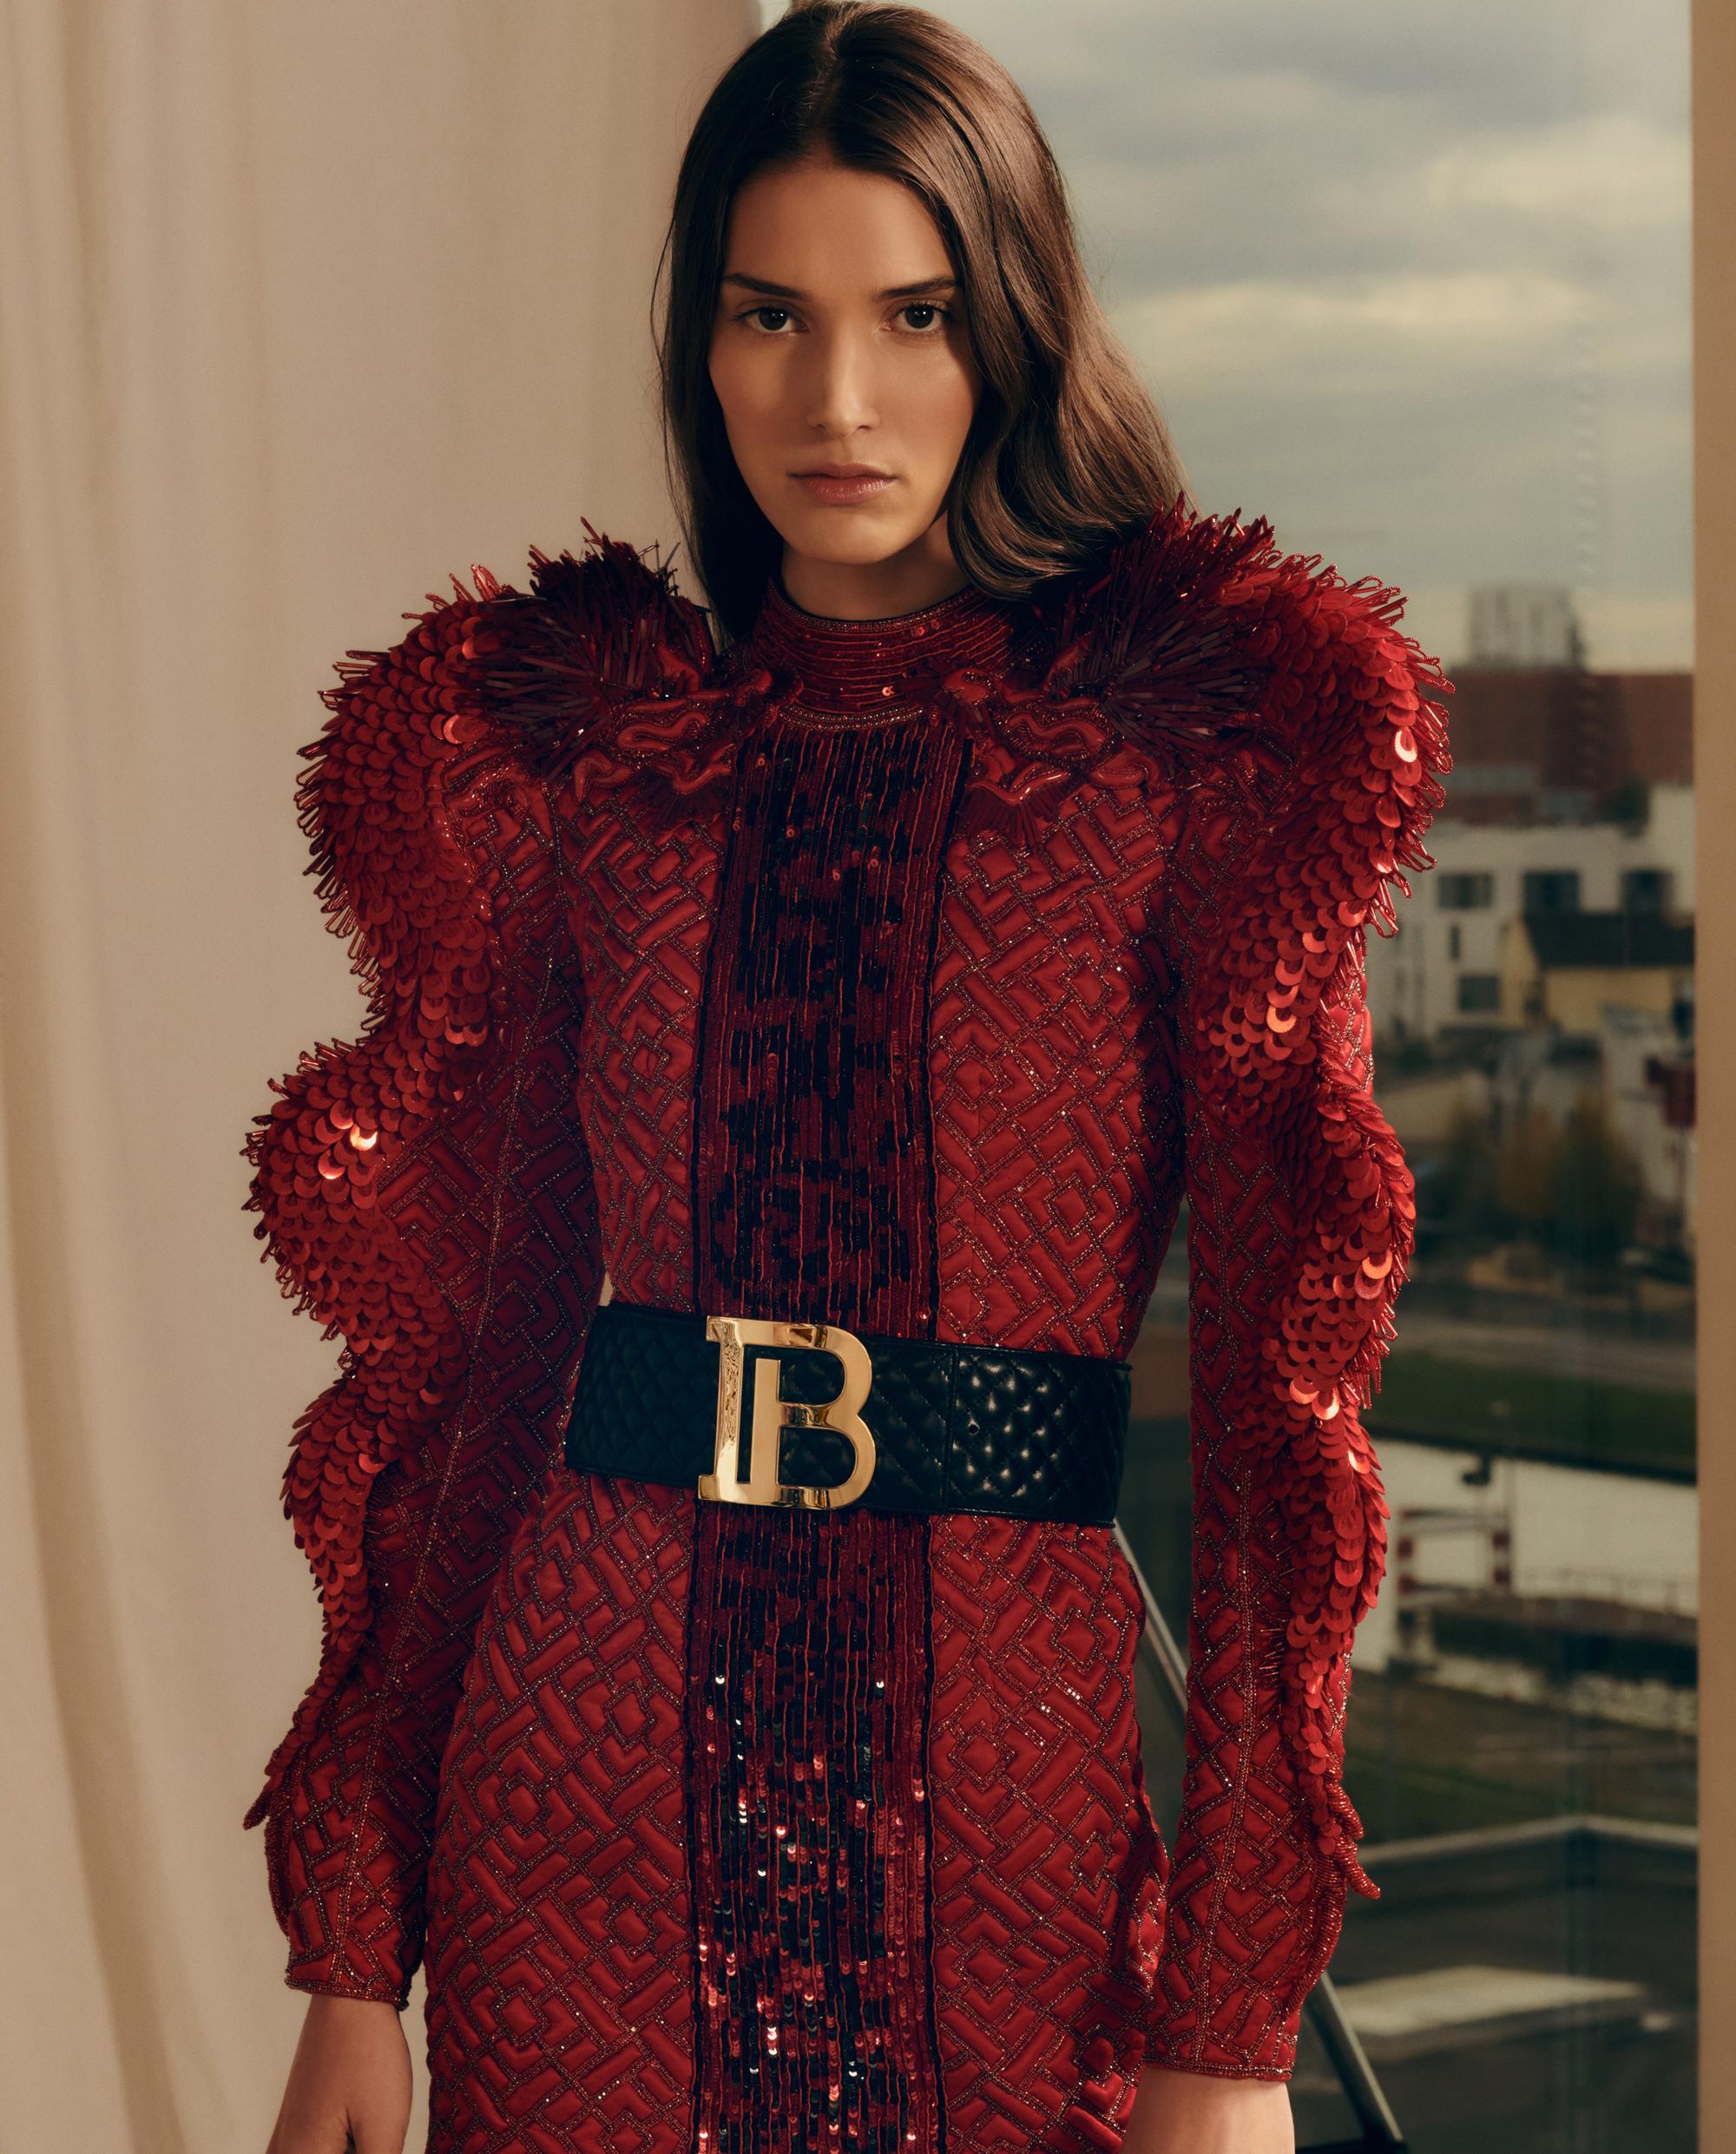 modelka czerwona sukienka balmain